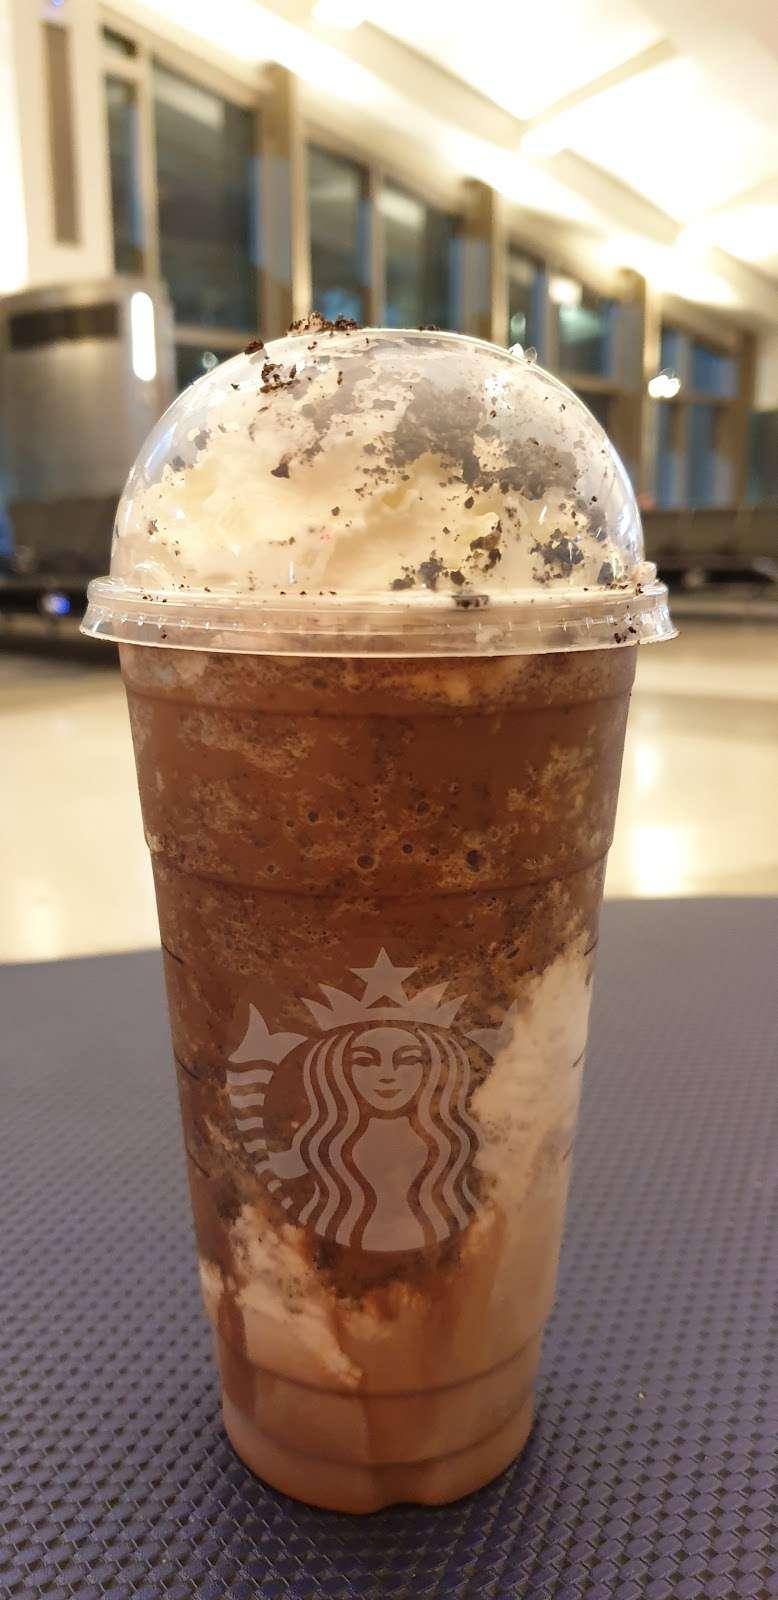 Starbucks - cafe    Photo 2 of 10   Address: 1 World Way, Los Angeles, CA 90045, USA   Phone: (310) 307-7535